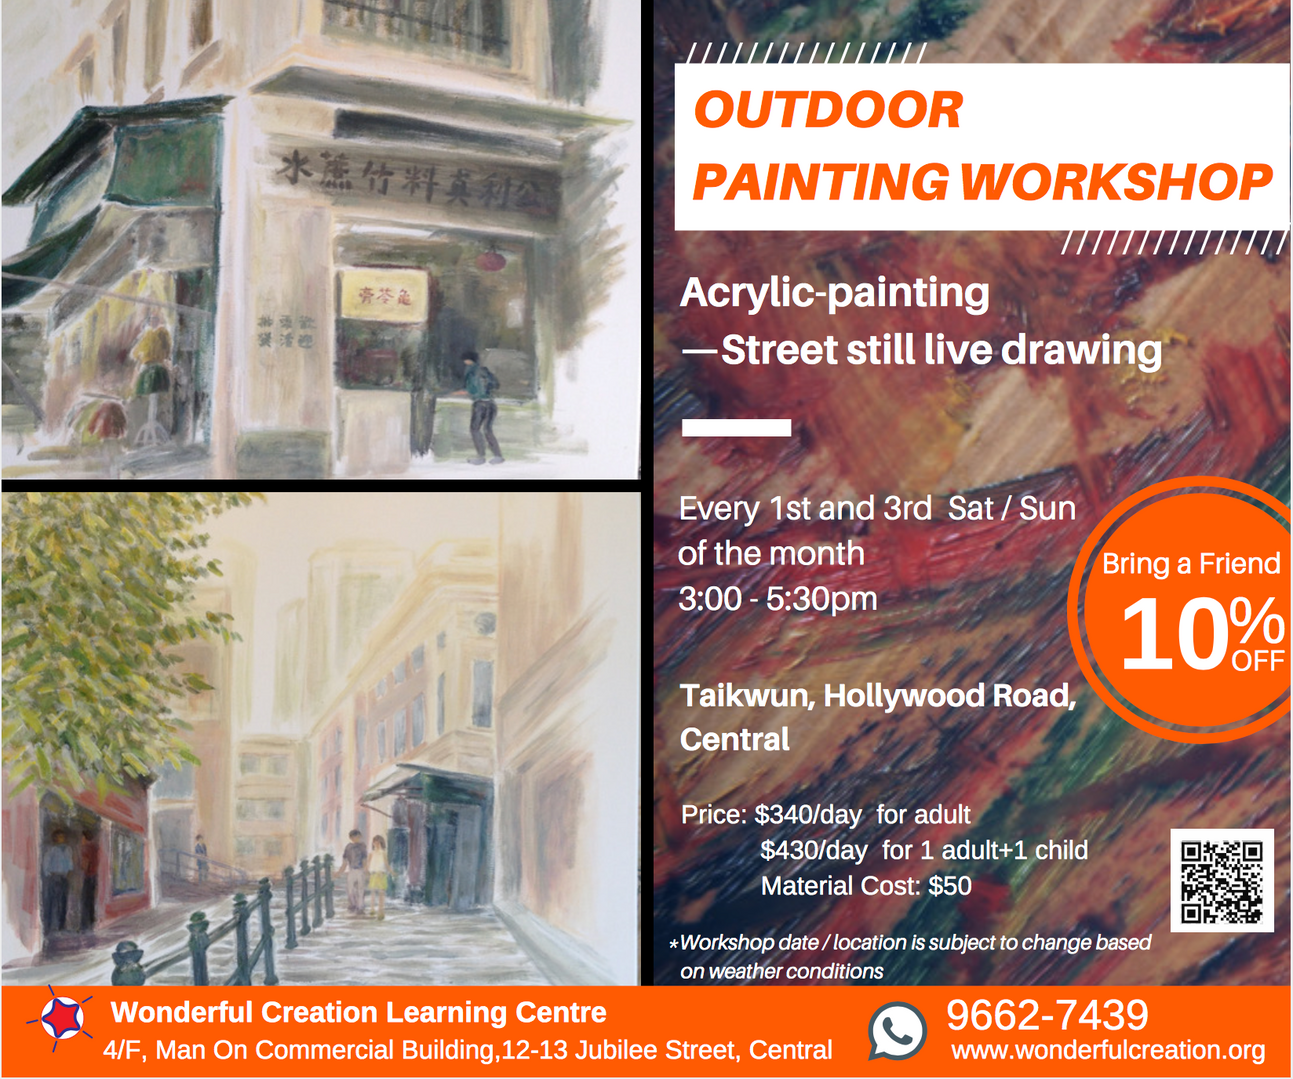 Outdoor Painting Workshop